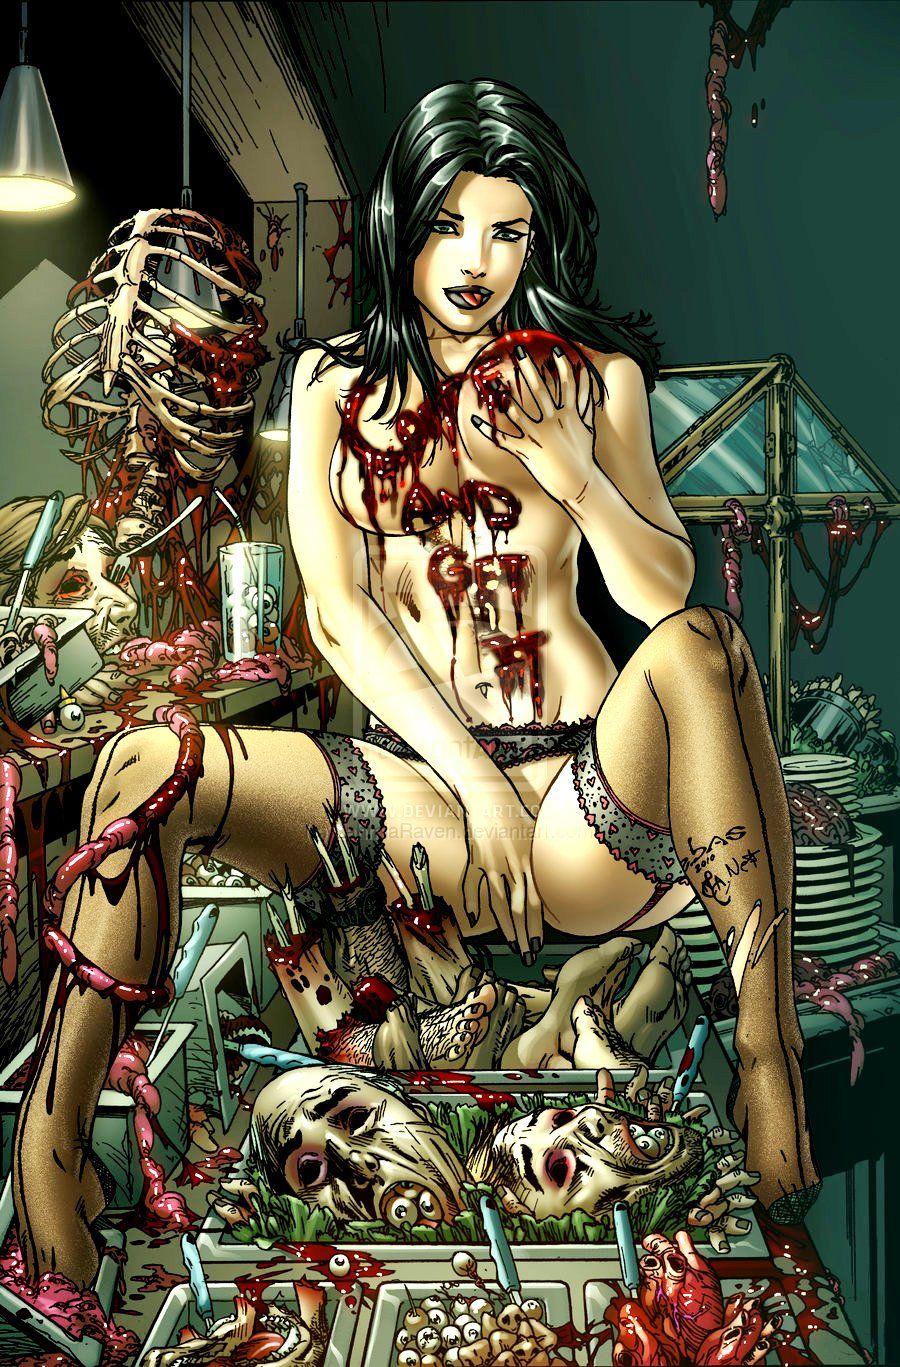 undressed girl pic during bleeding